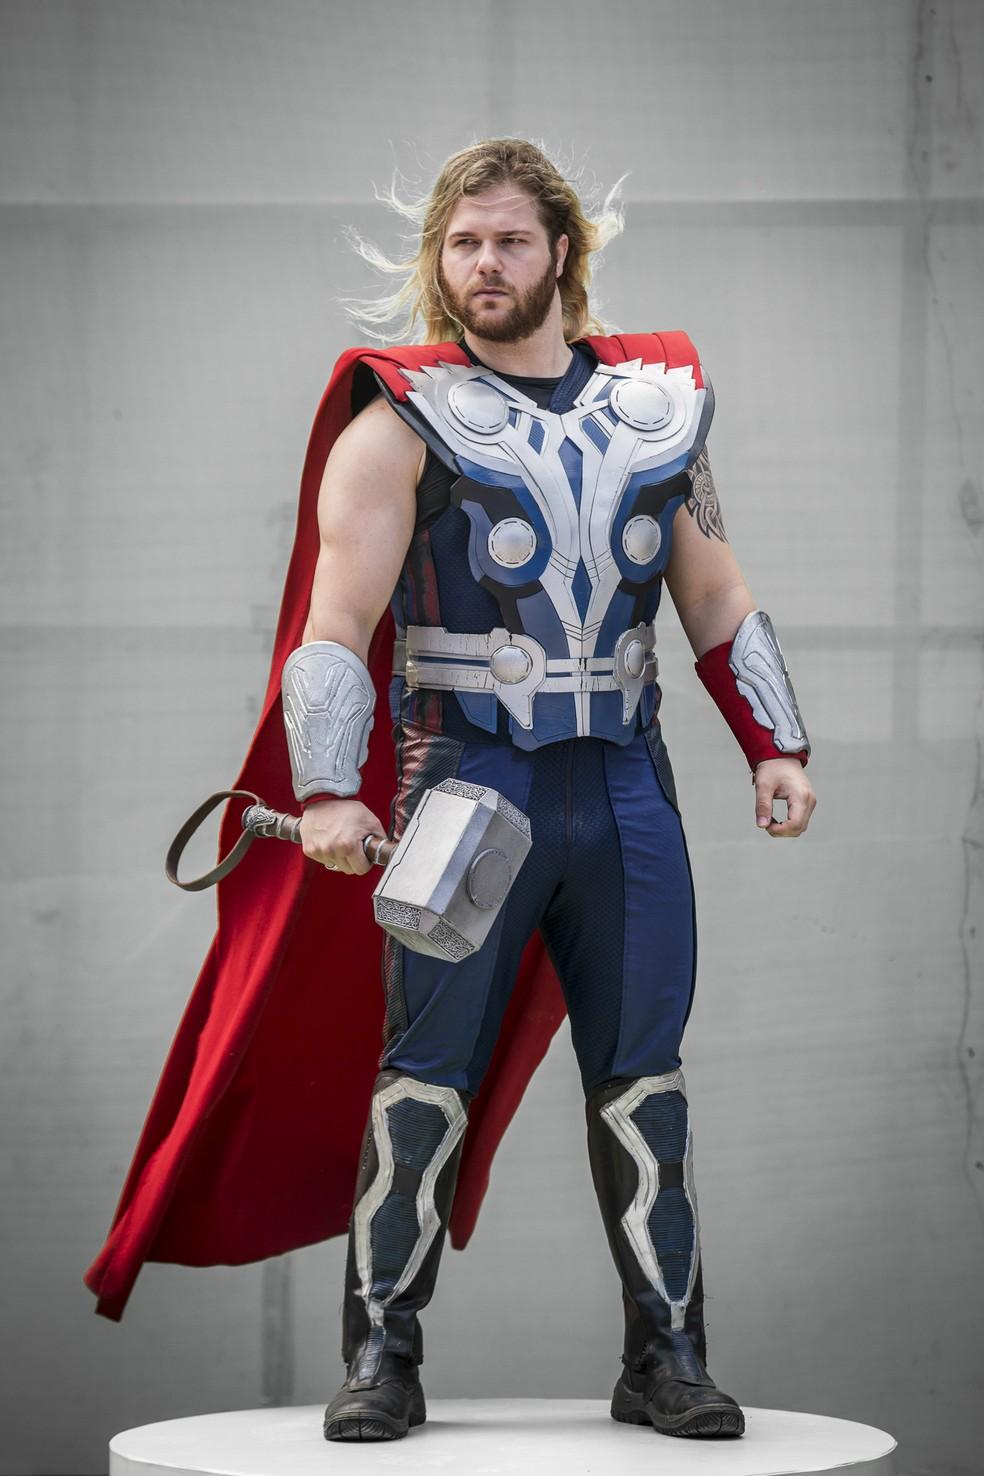 Thor — Foto: Artur Meninea/Gshow